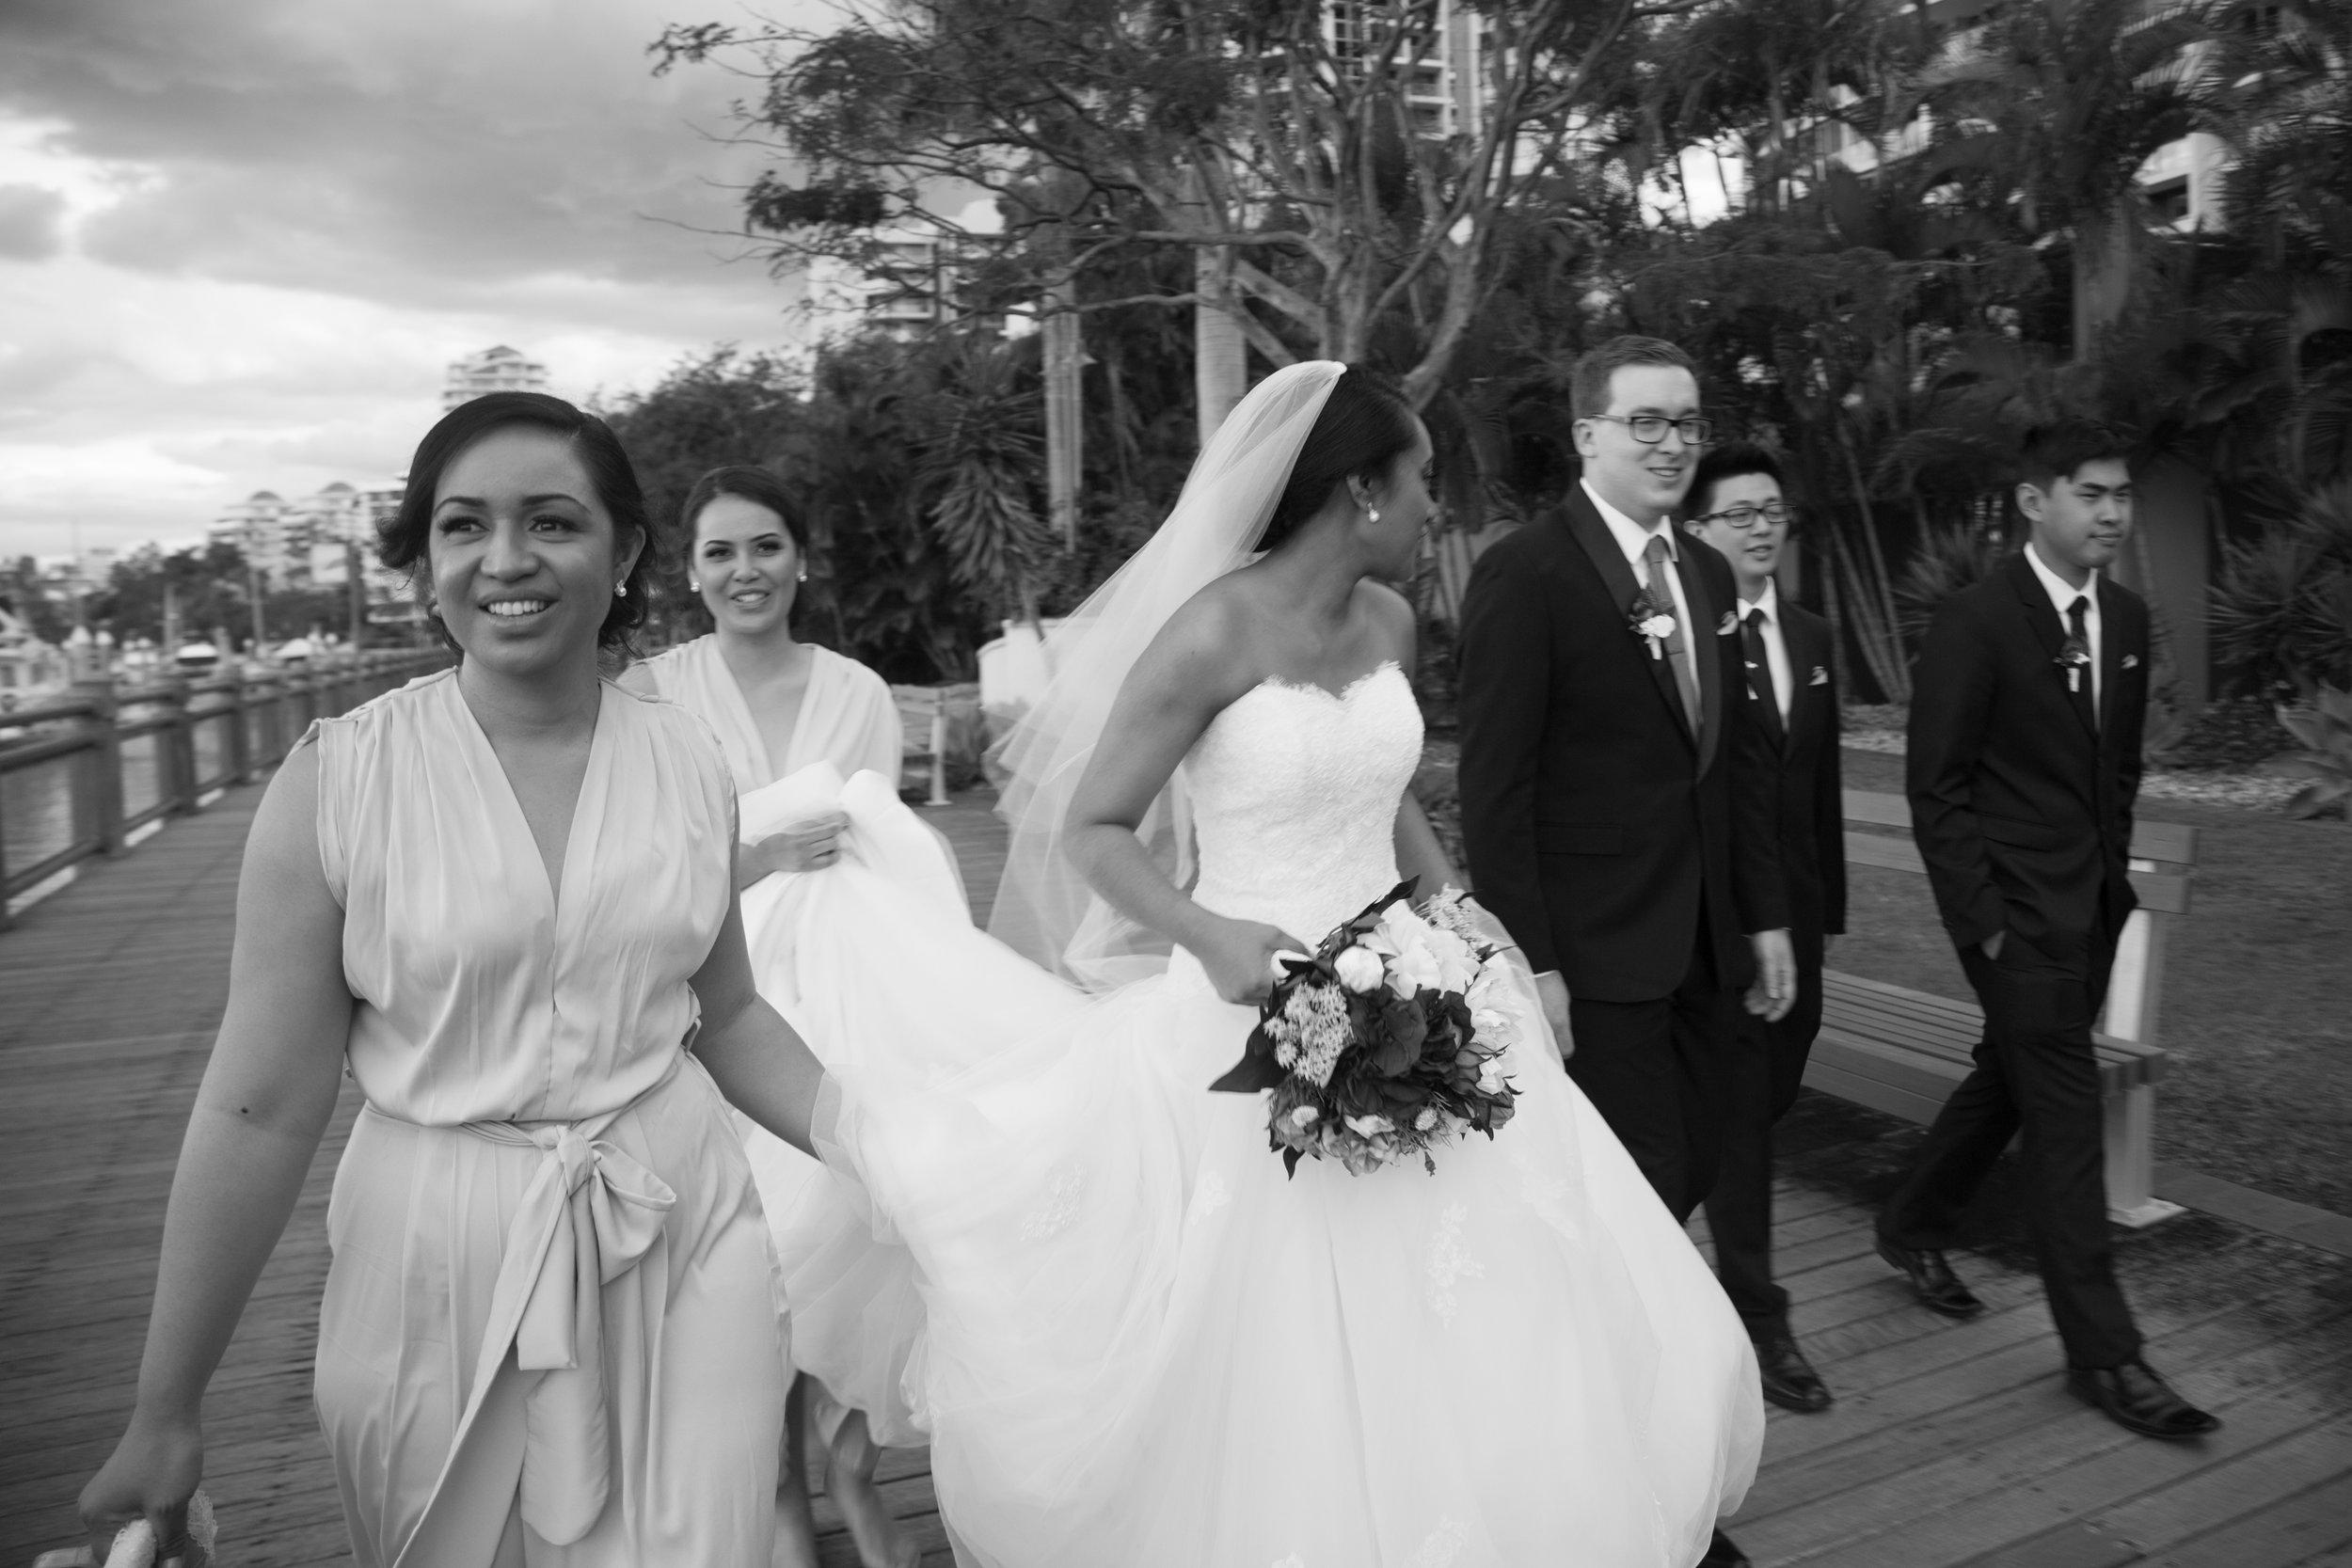 Rohan James Photography - Sophia & Dan Wedding Party & Portraits-5.jpg